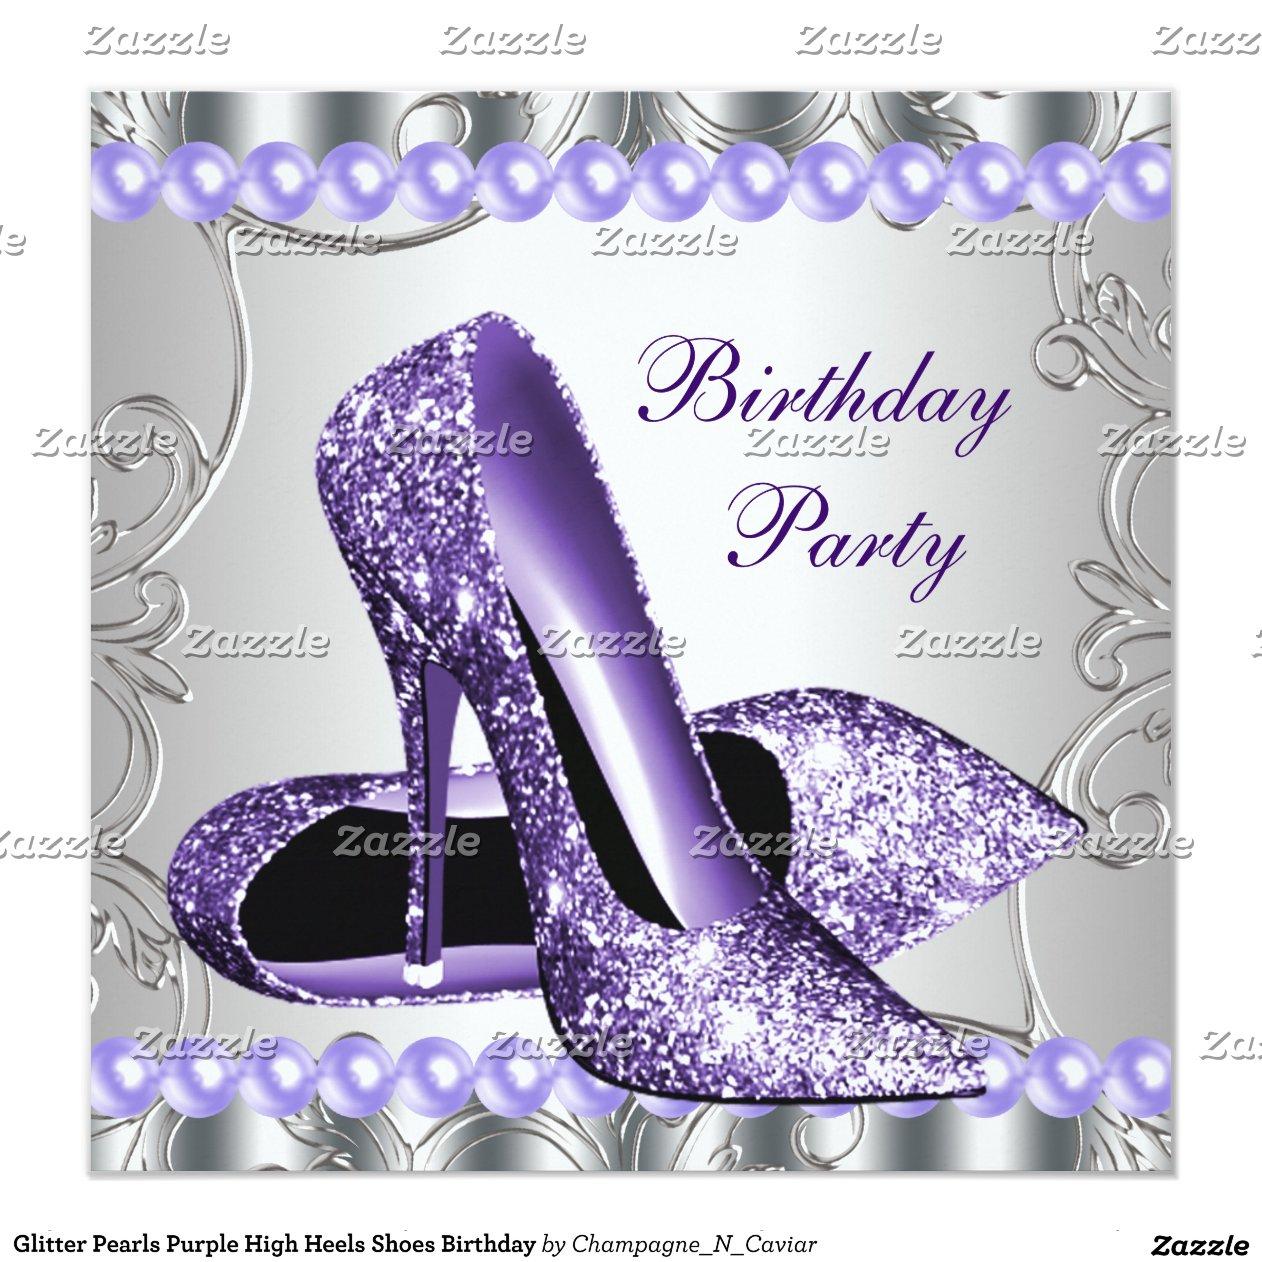 glitter_pearls_purple_high_heels_shoes_birthday_invitation ...